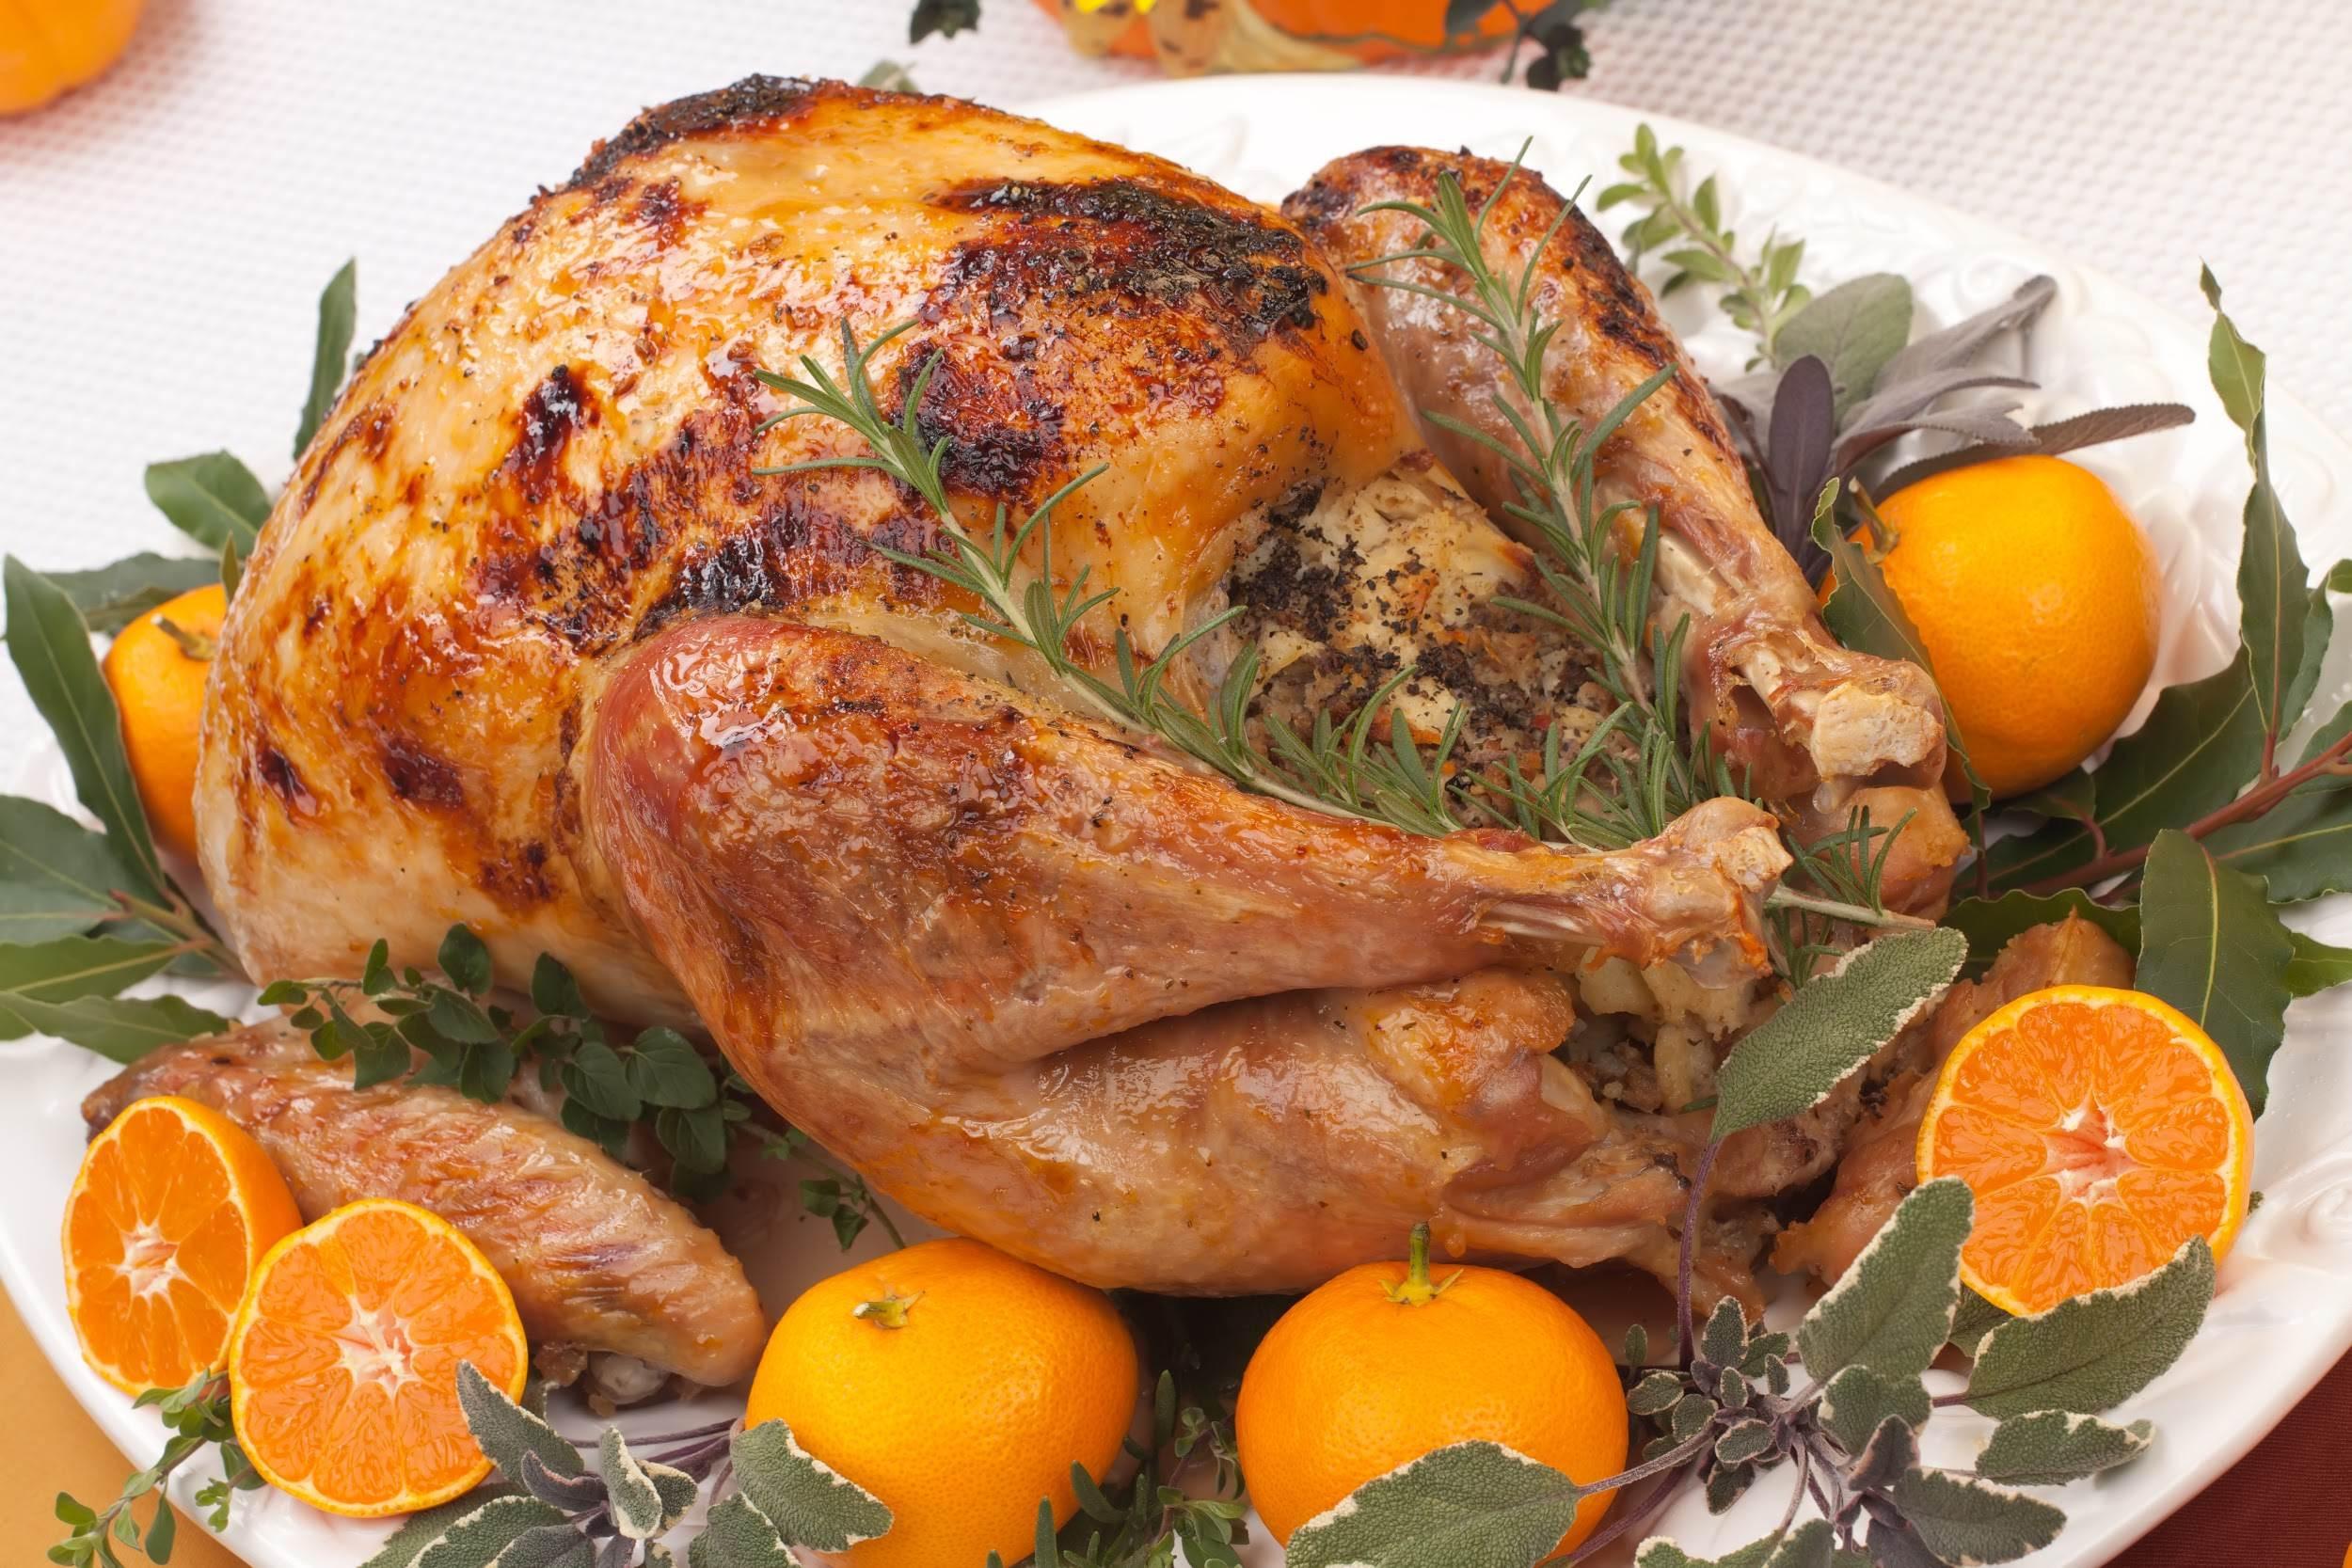 Roasted Turkey Recipes Thanksgiving  Whole Citrus Roasted Turkey Recipe Paleo Plan